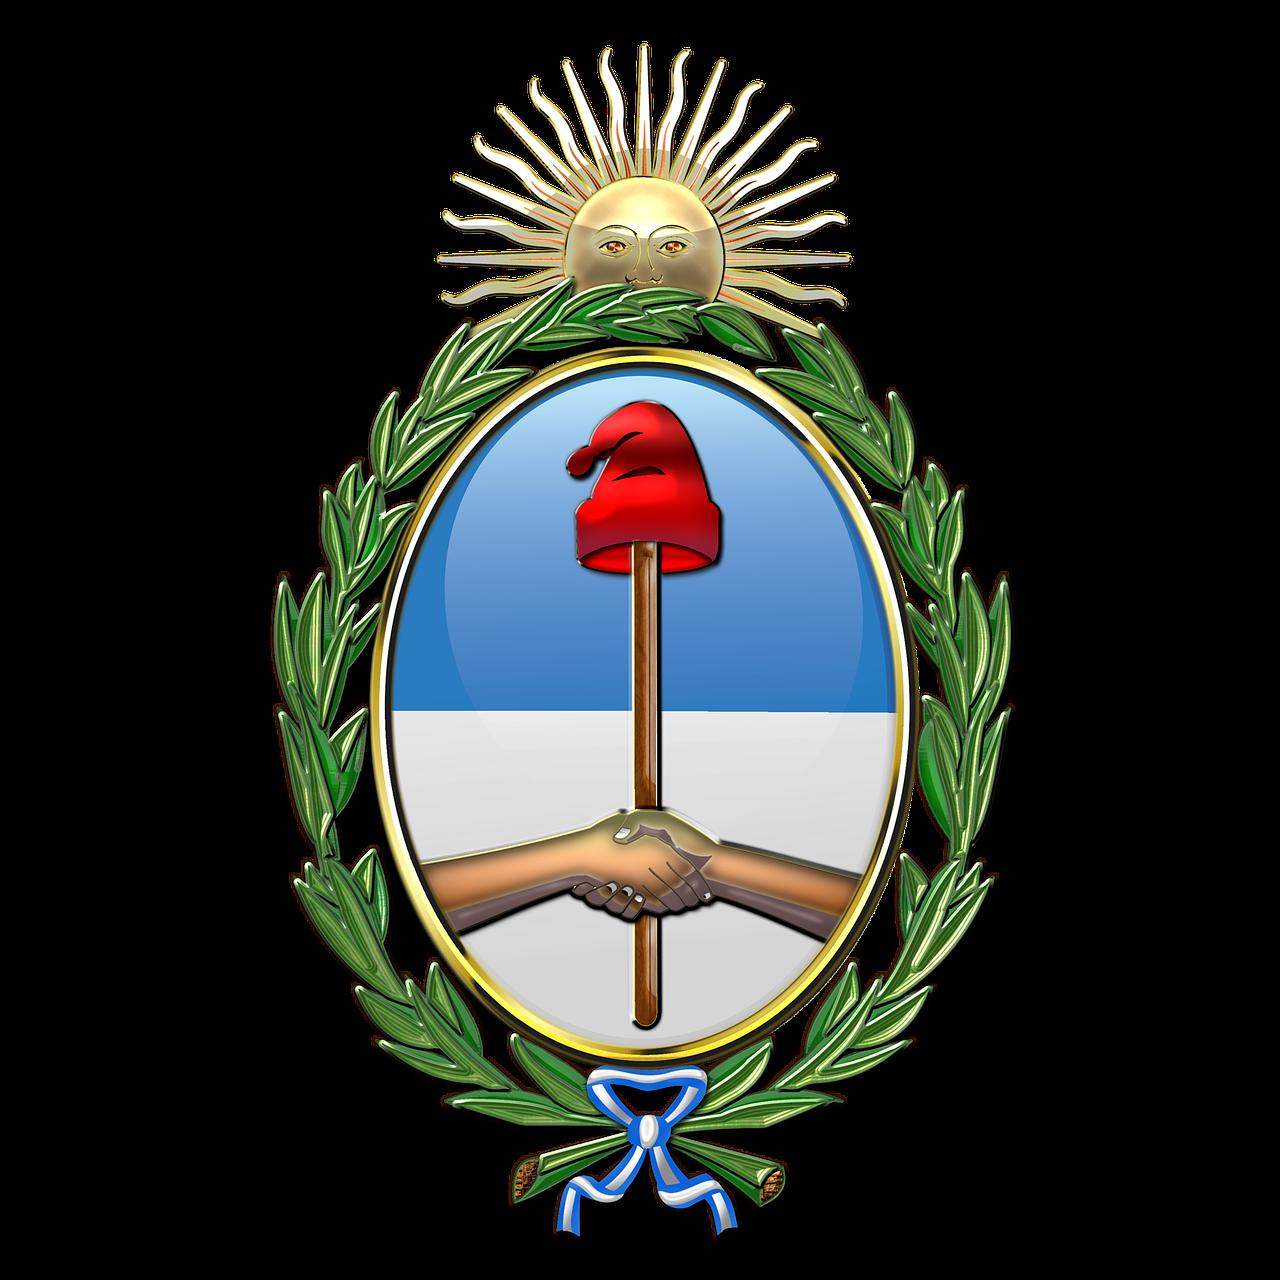 аргентина картинки флаг и герб формы бокса конструкция